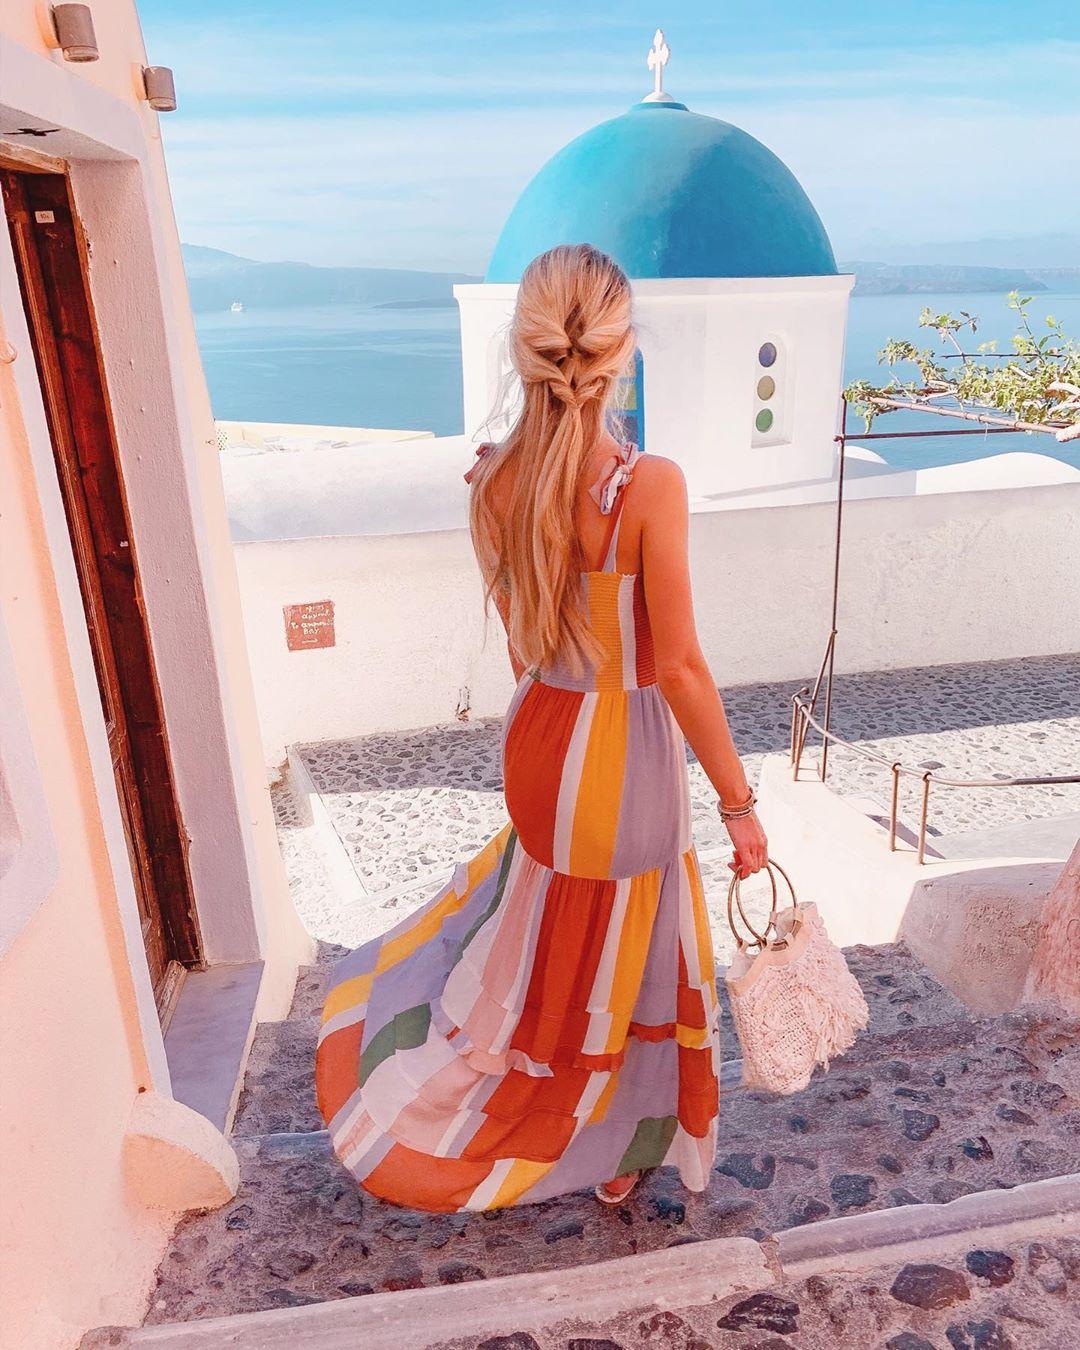 Santorini Travel Guide Katies Bliss